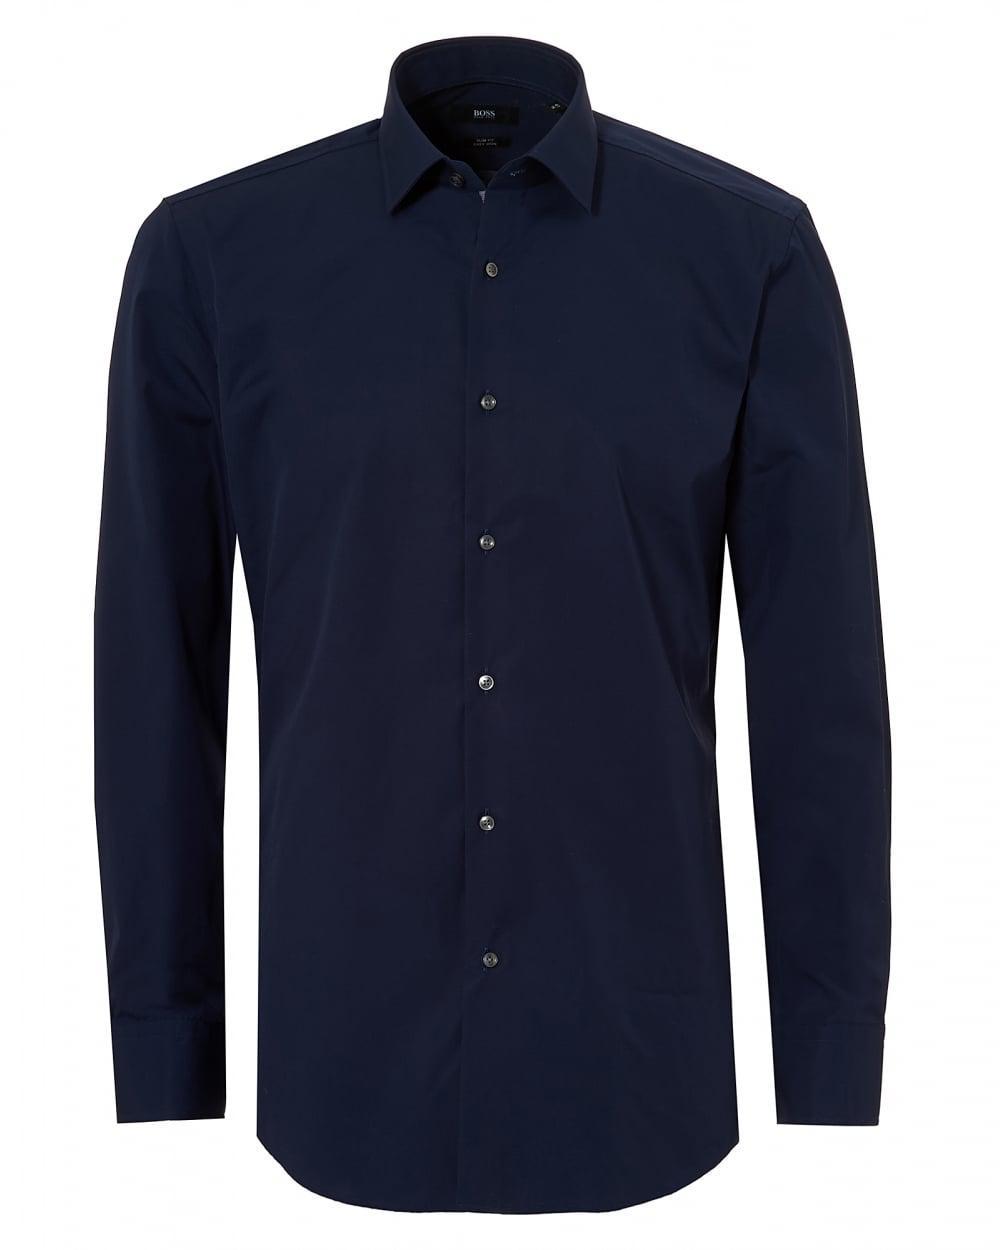 Lyst boss black navy blue jerris slim fit inner trim for Navy slim fit shirt